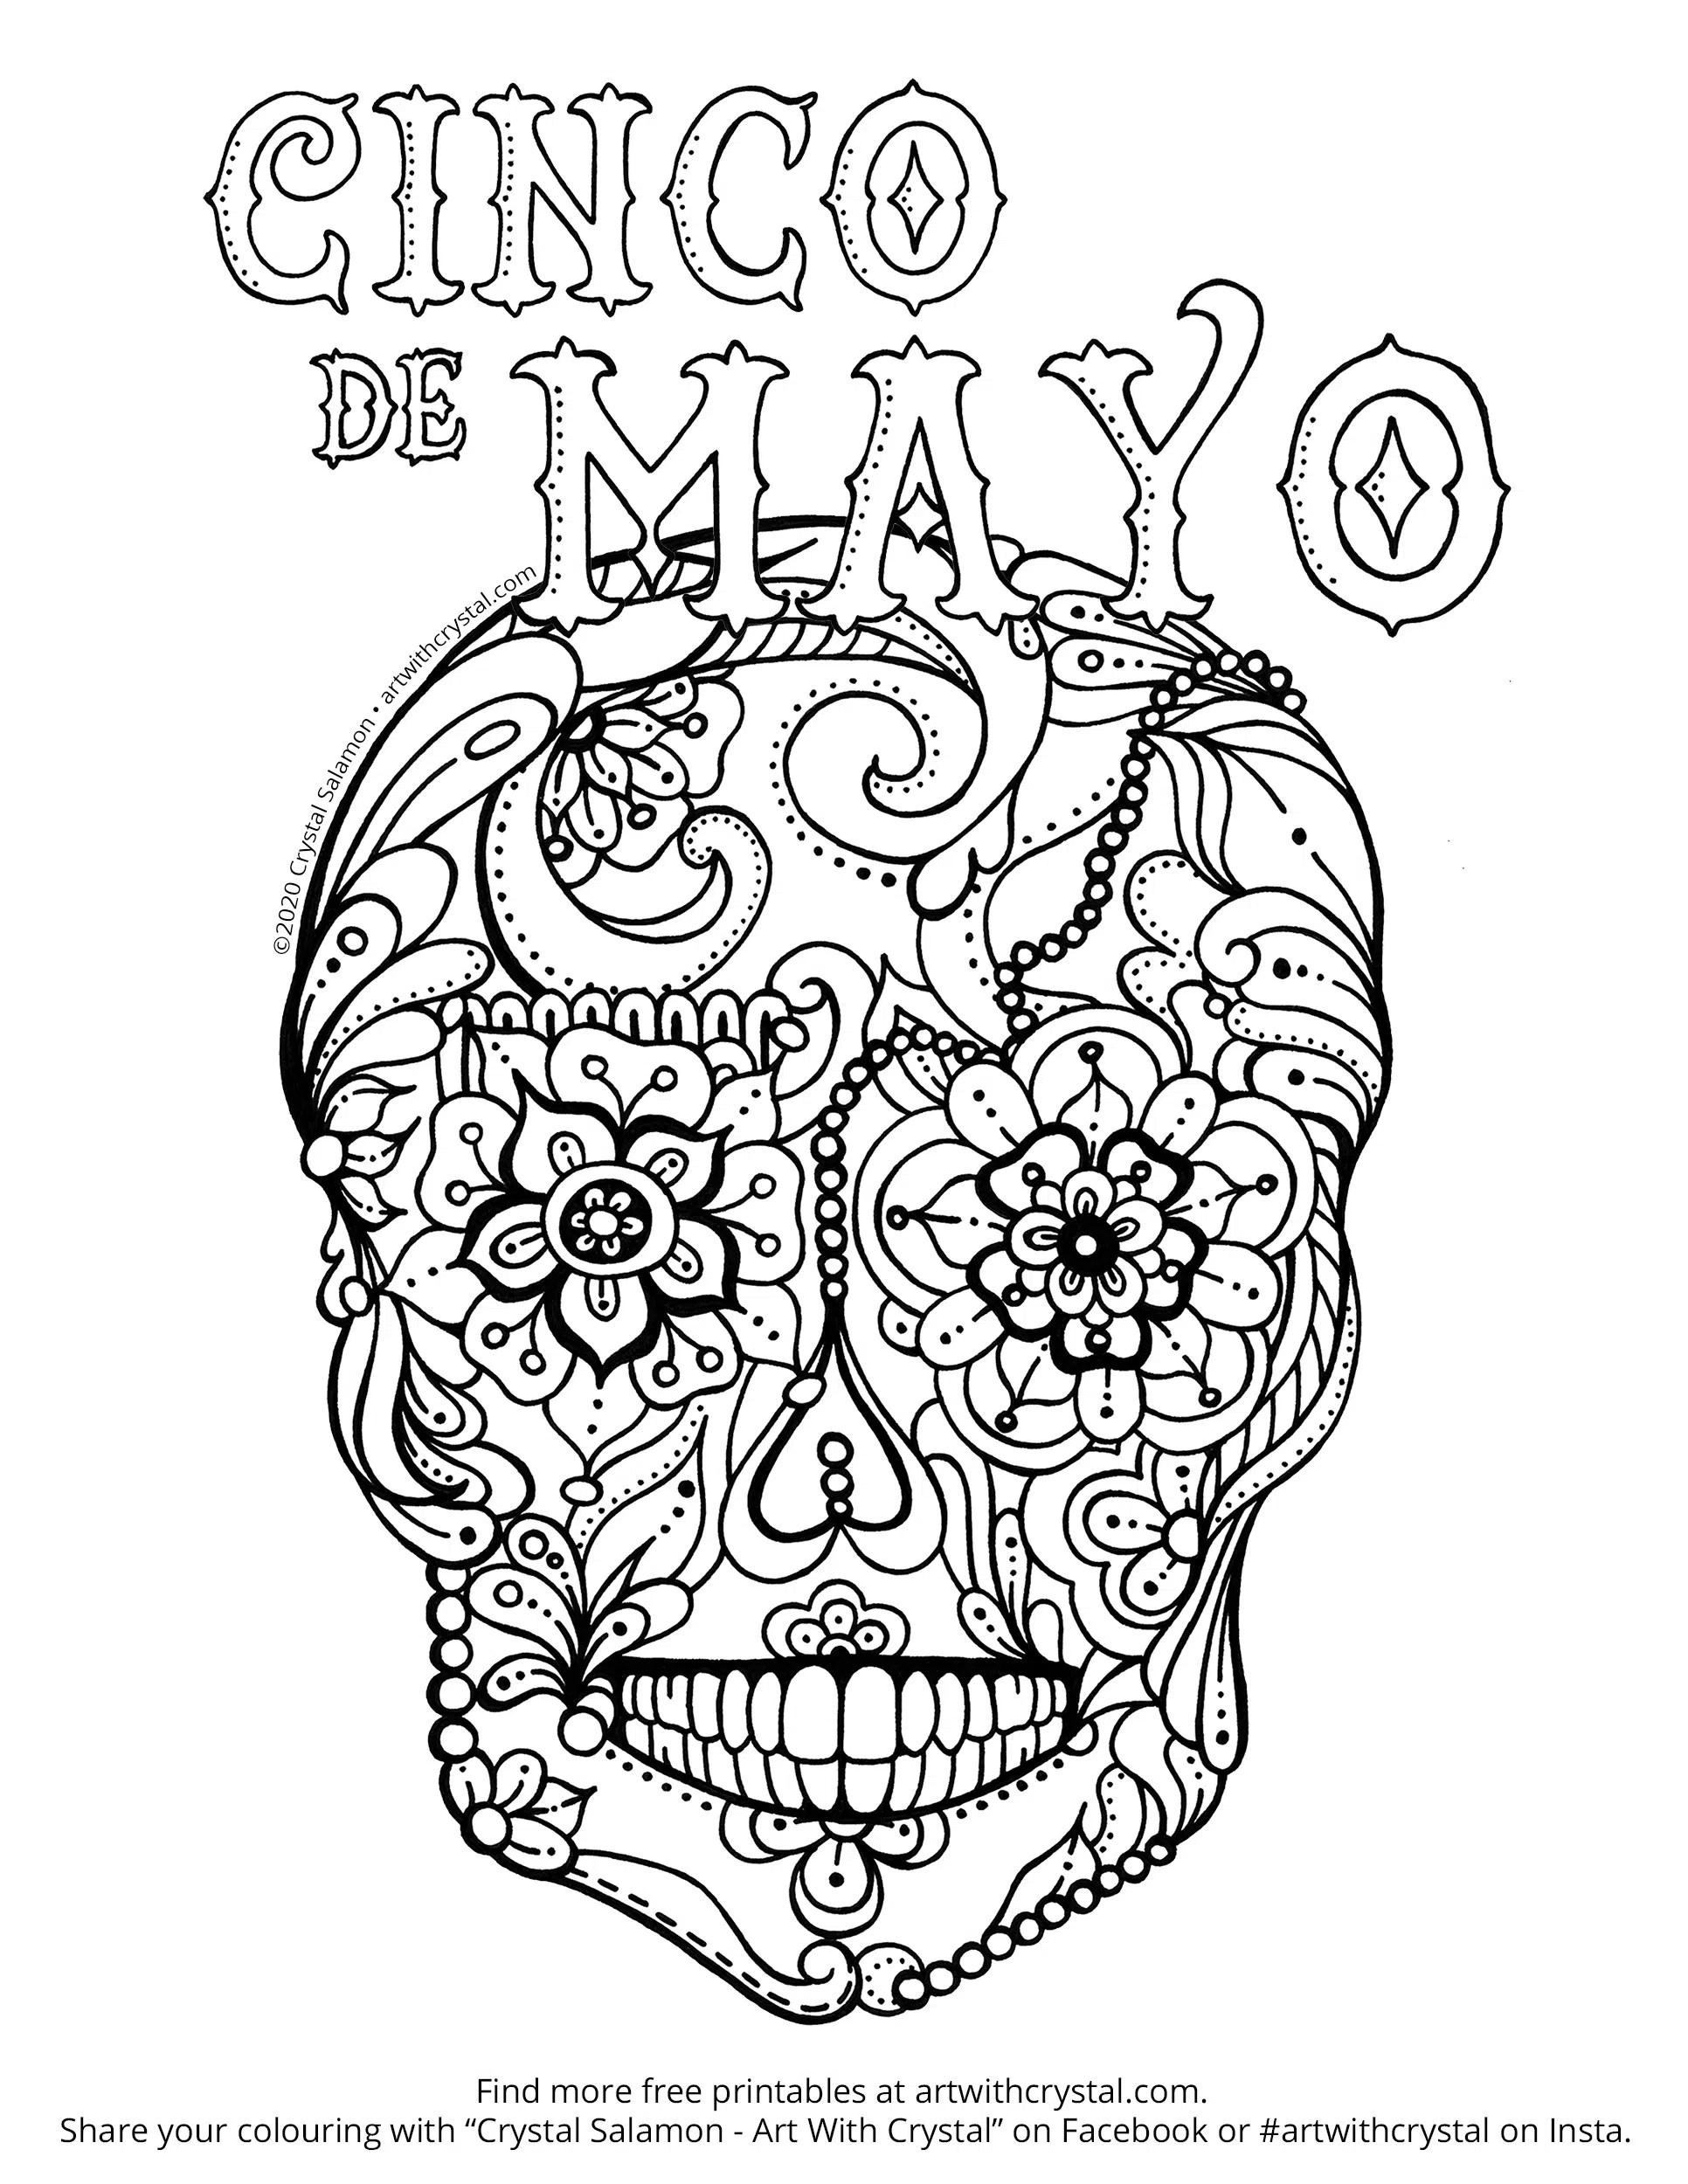 Cinco De Mayo Free Printable Colouring Page